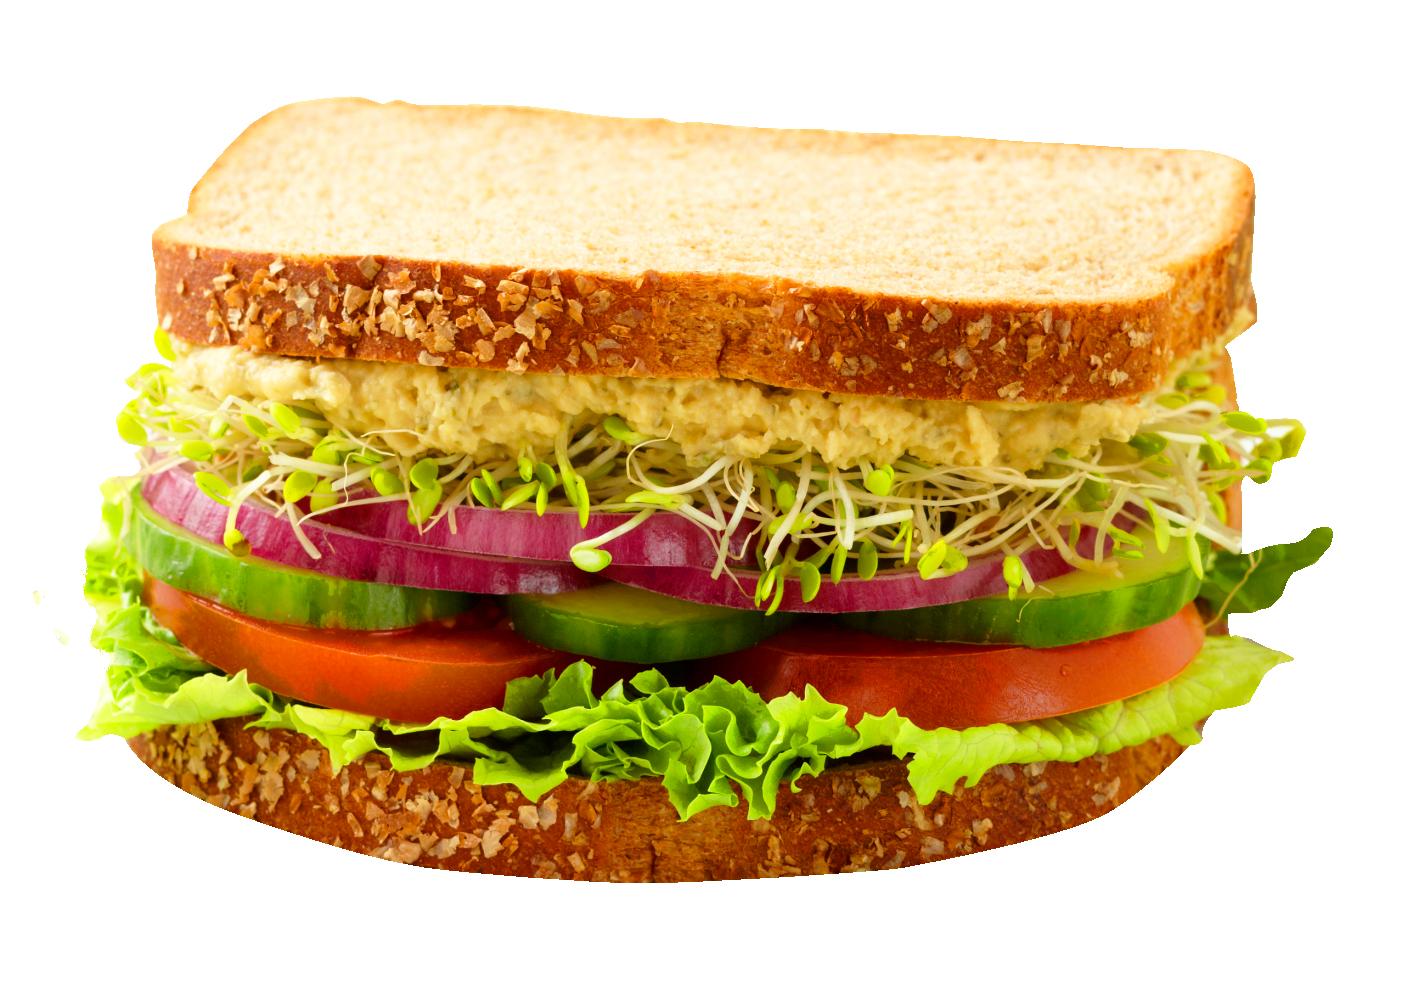 Sandwich Png Transparent Image Healthy Sandwiches Healthy Vegetarian Sandwich